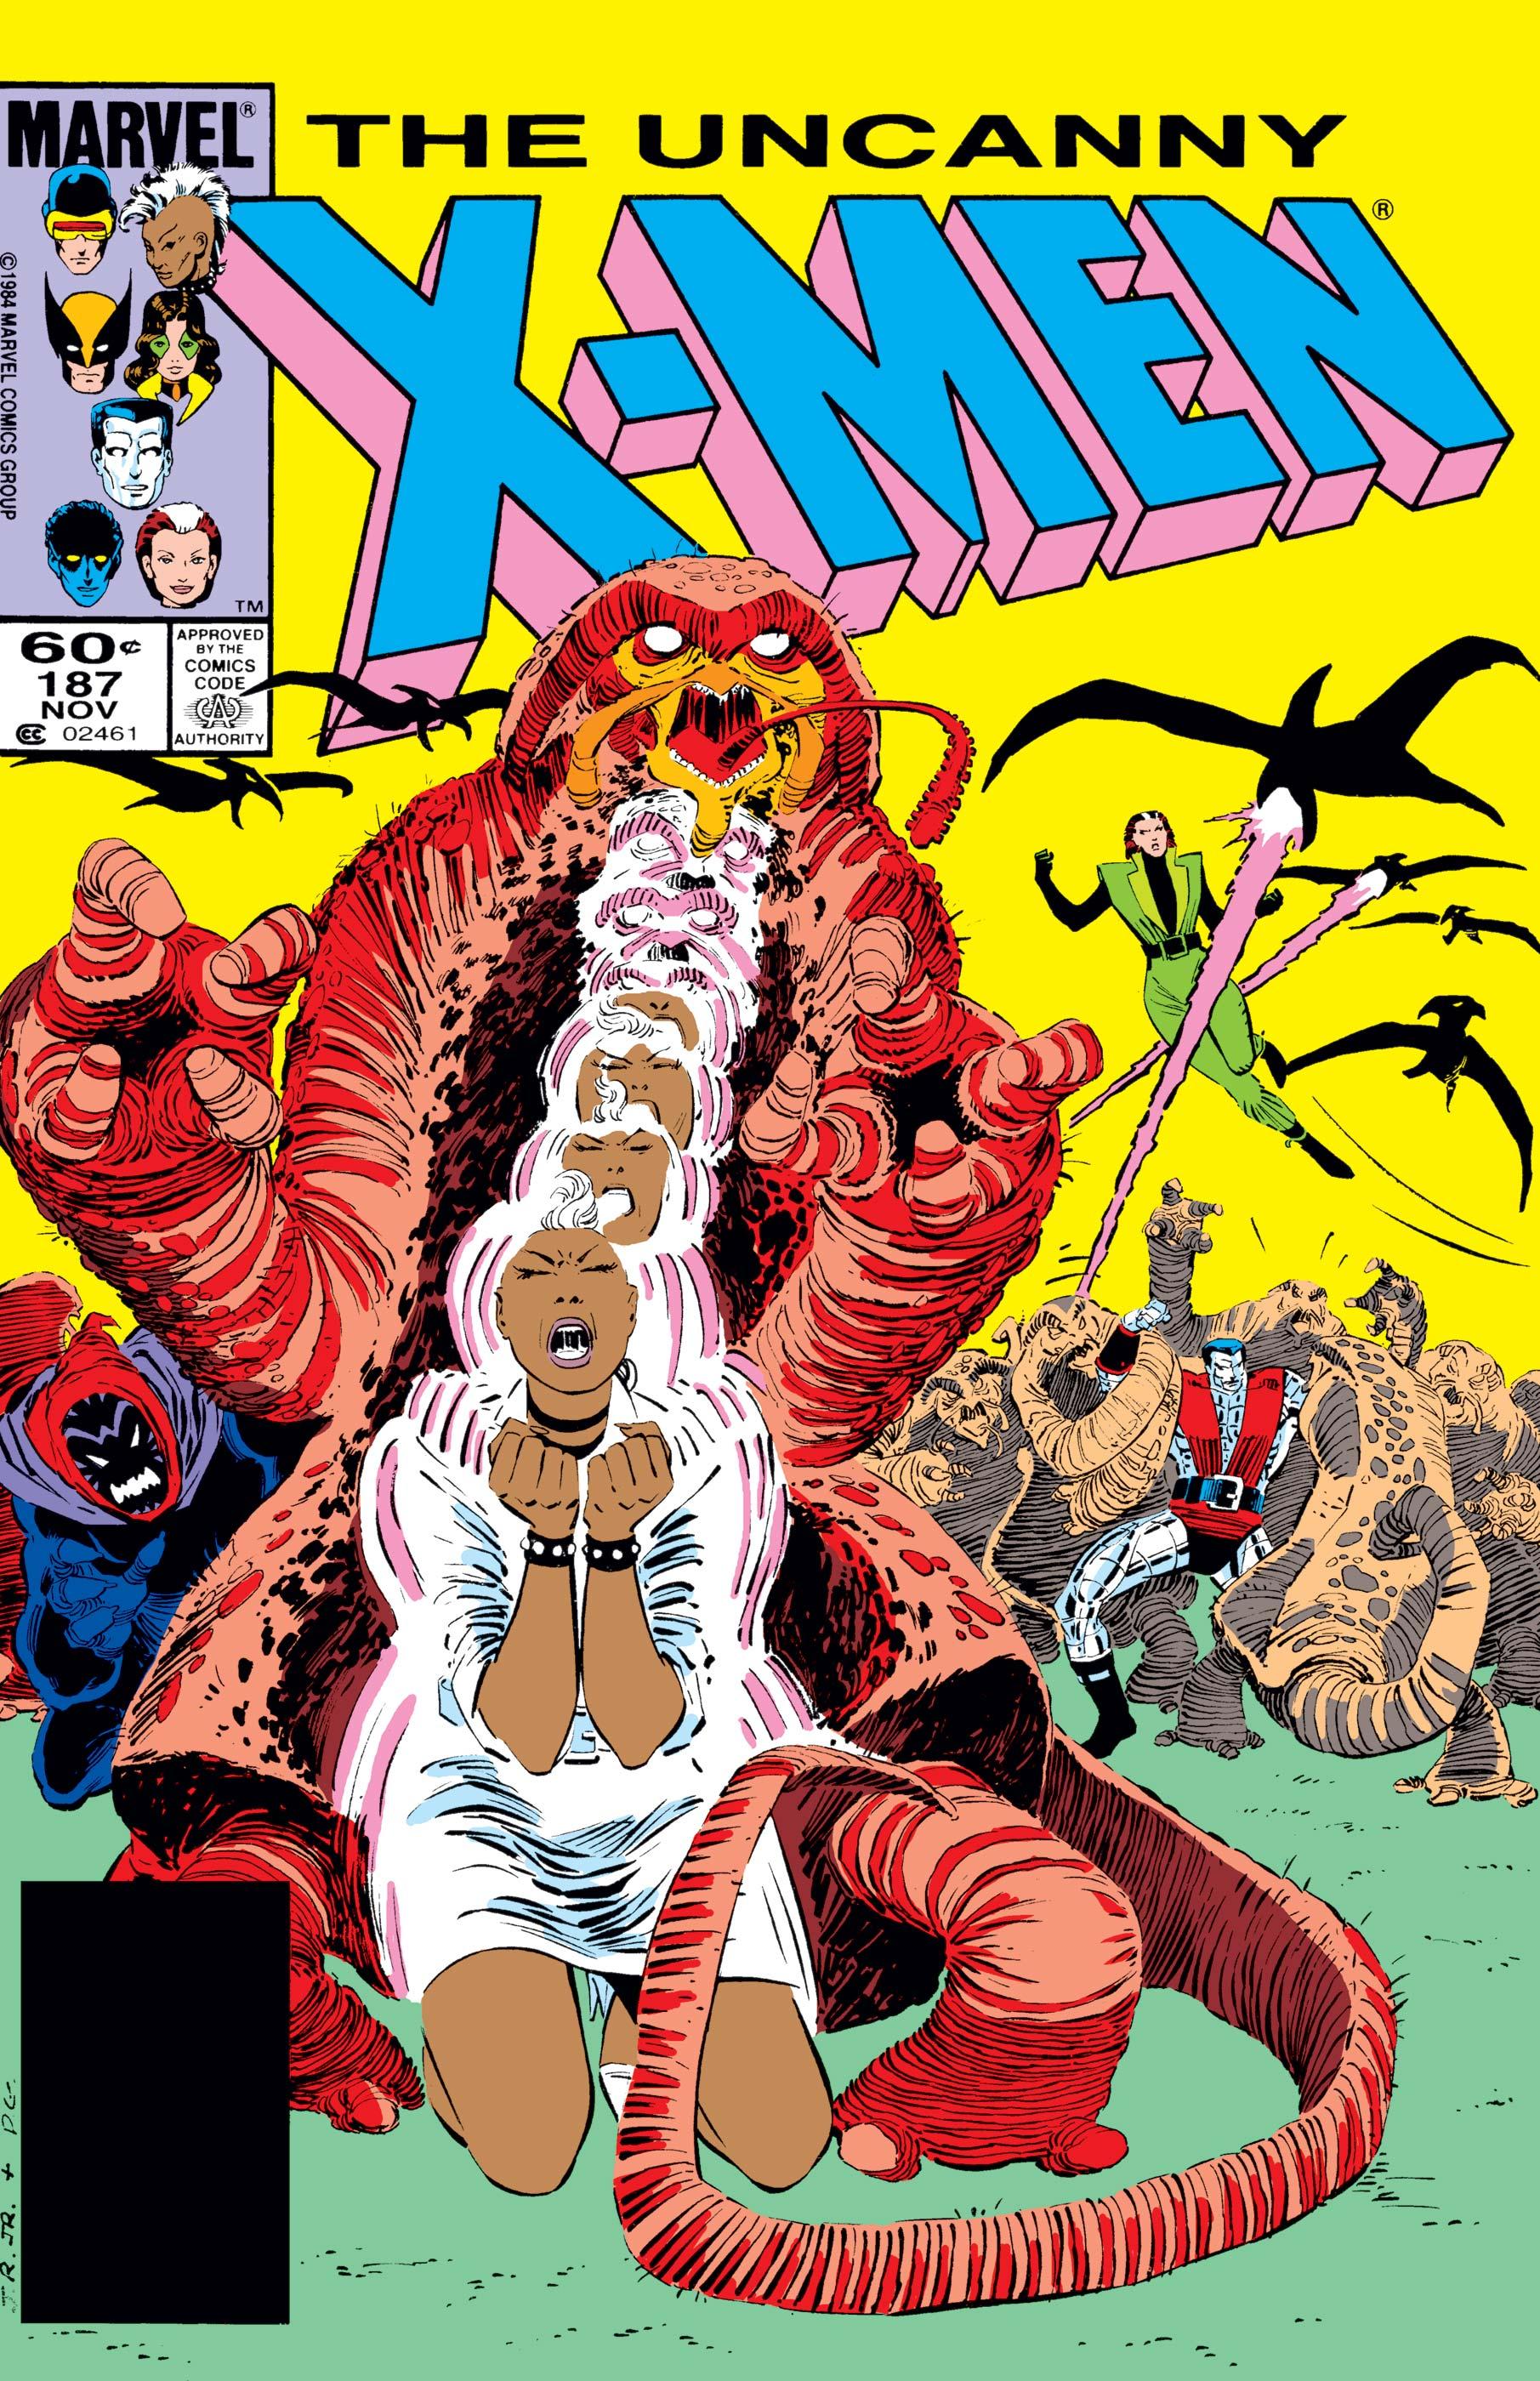 Uncanny X-Men (1963) #187